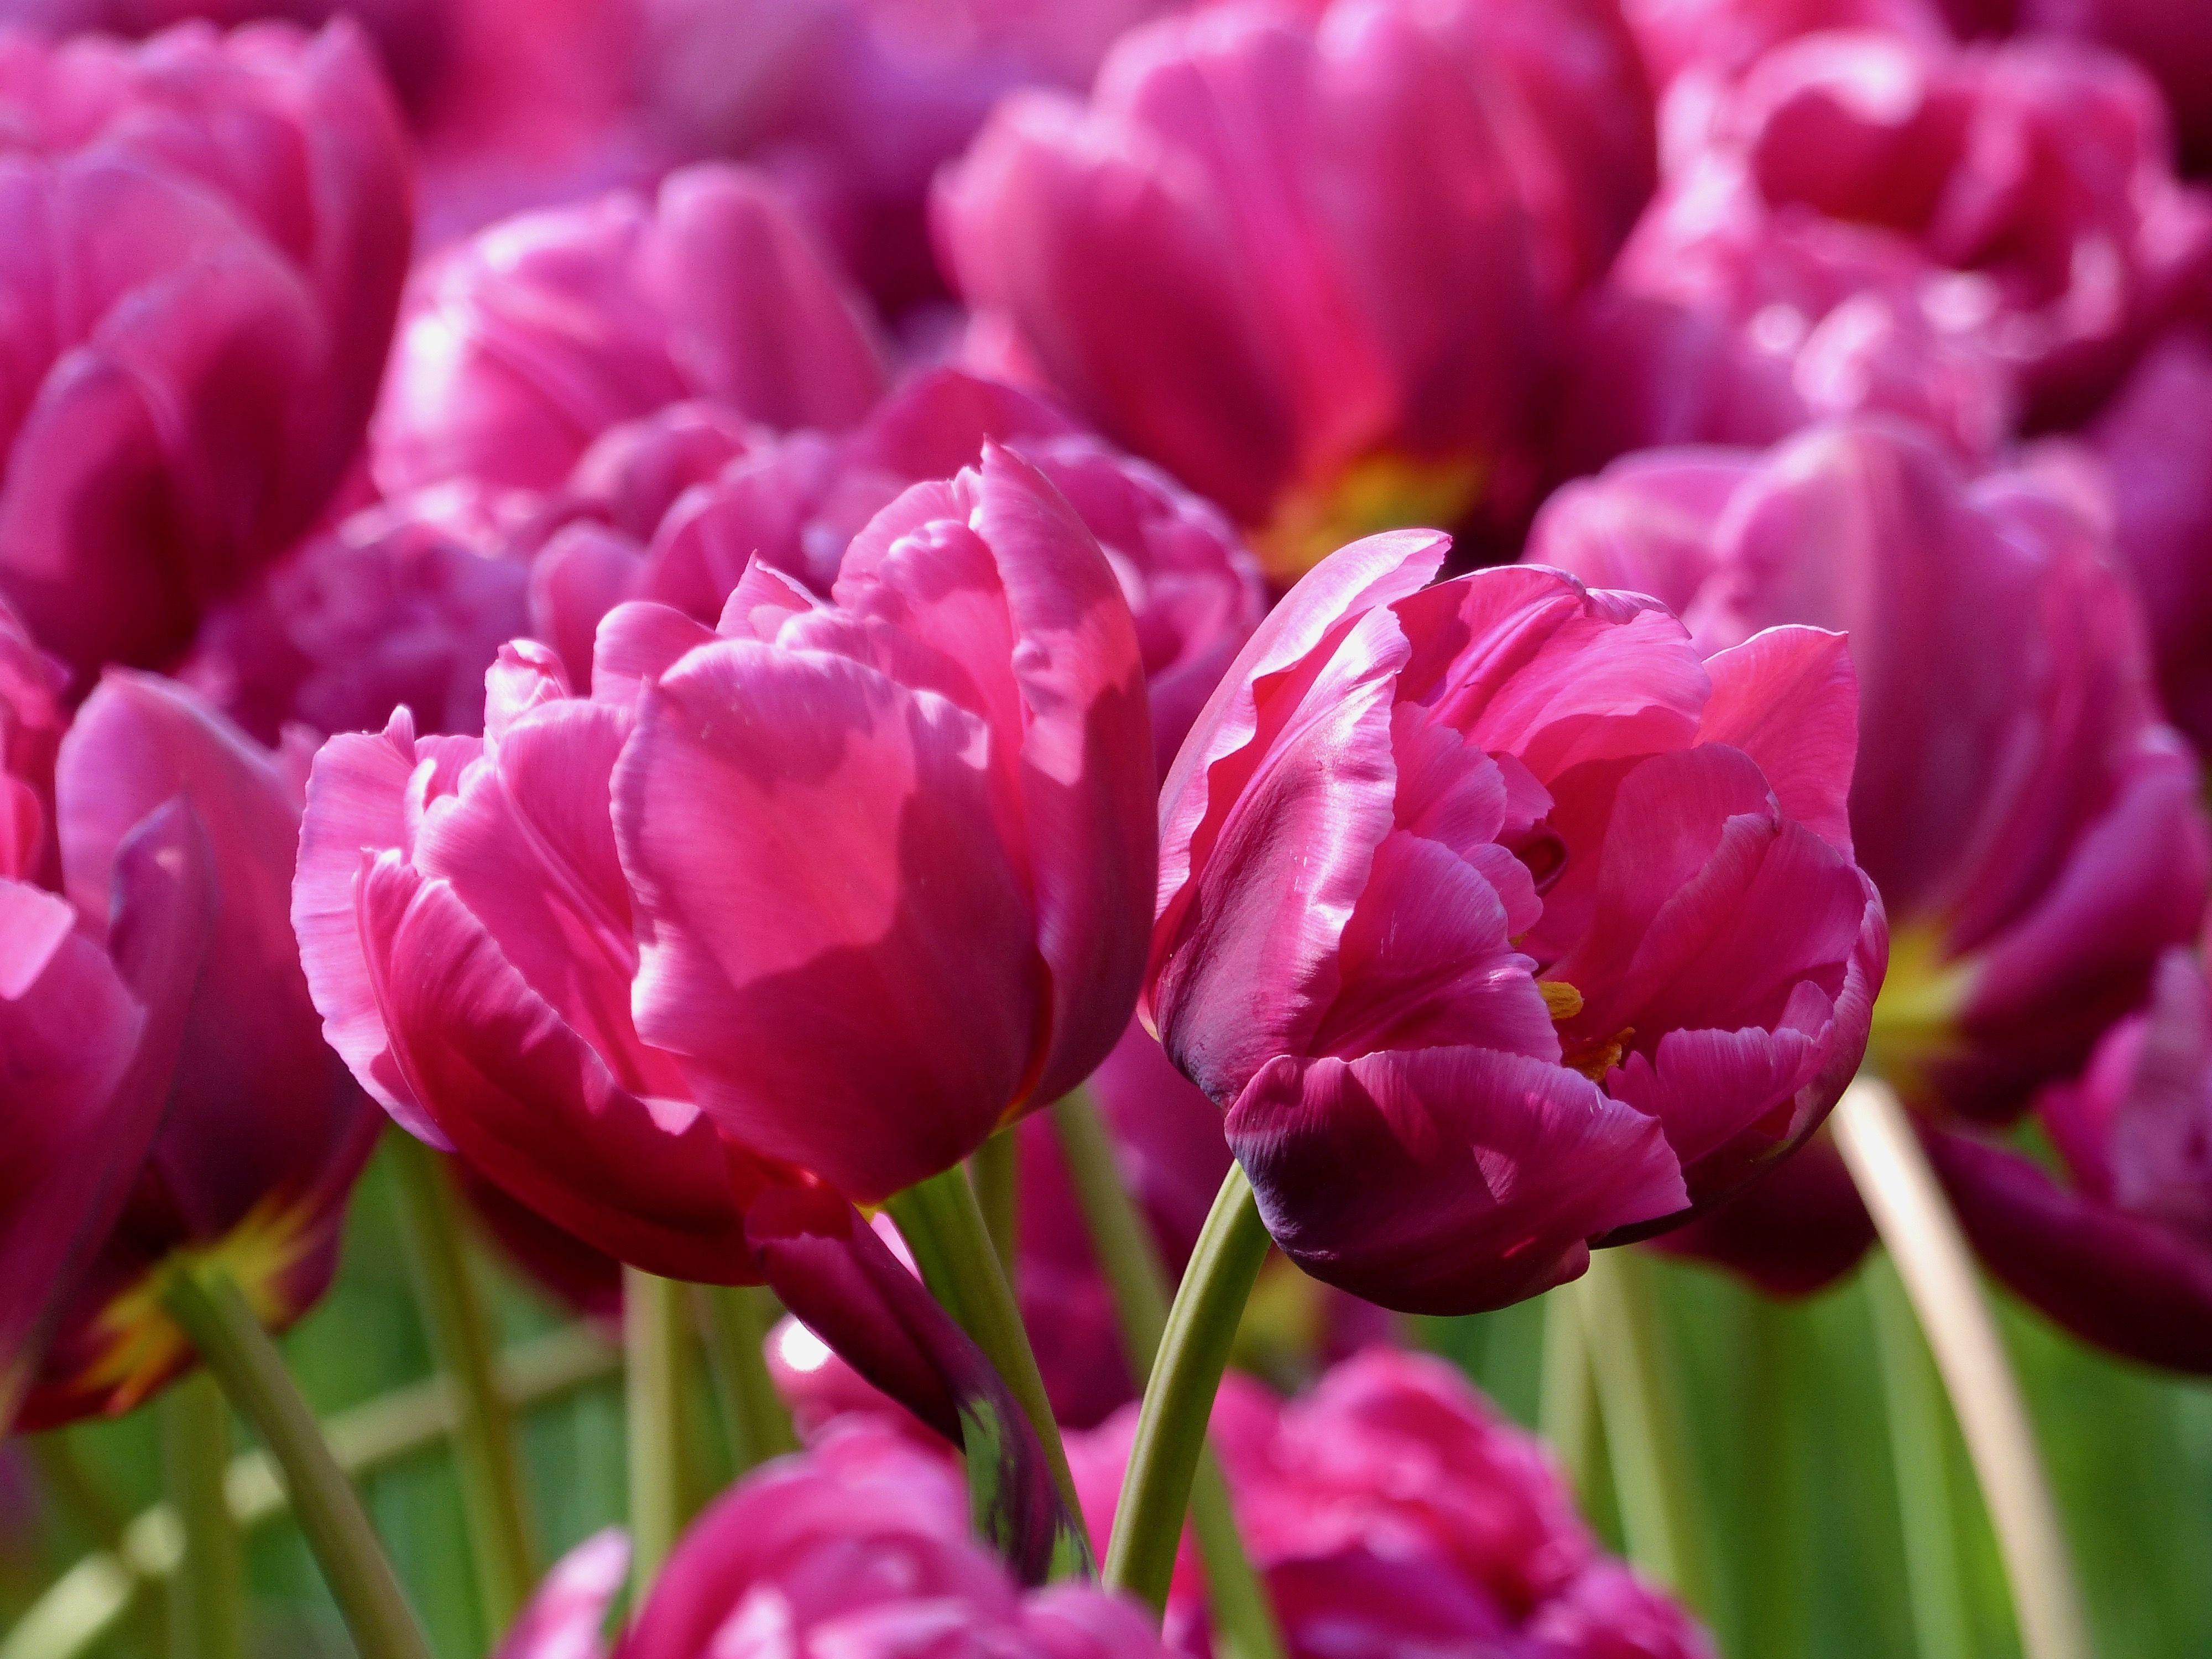 Tulpe Margarita Tulpen Fruhlingsgarten Tulpenzwiebeln